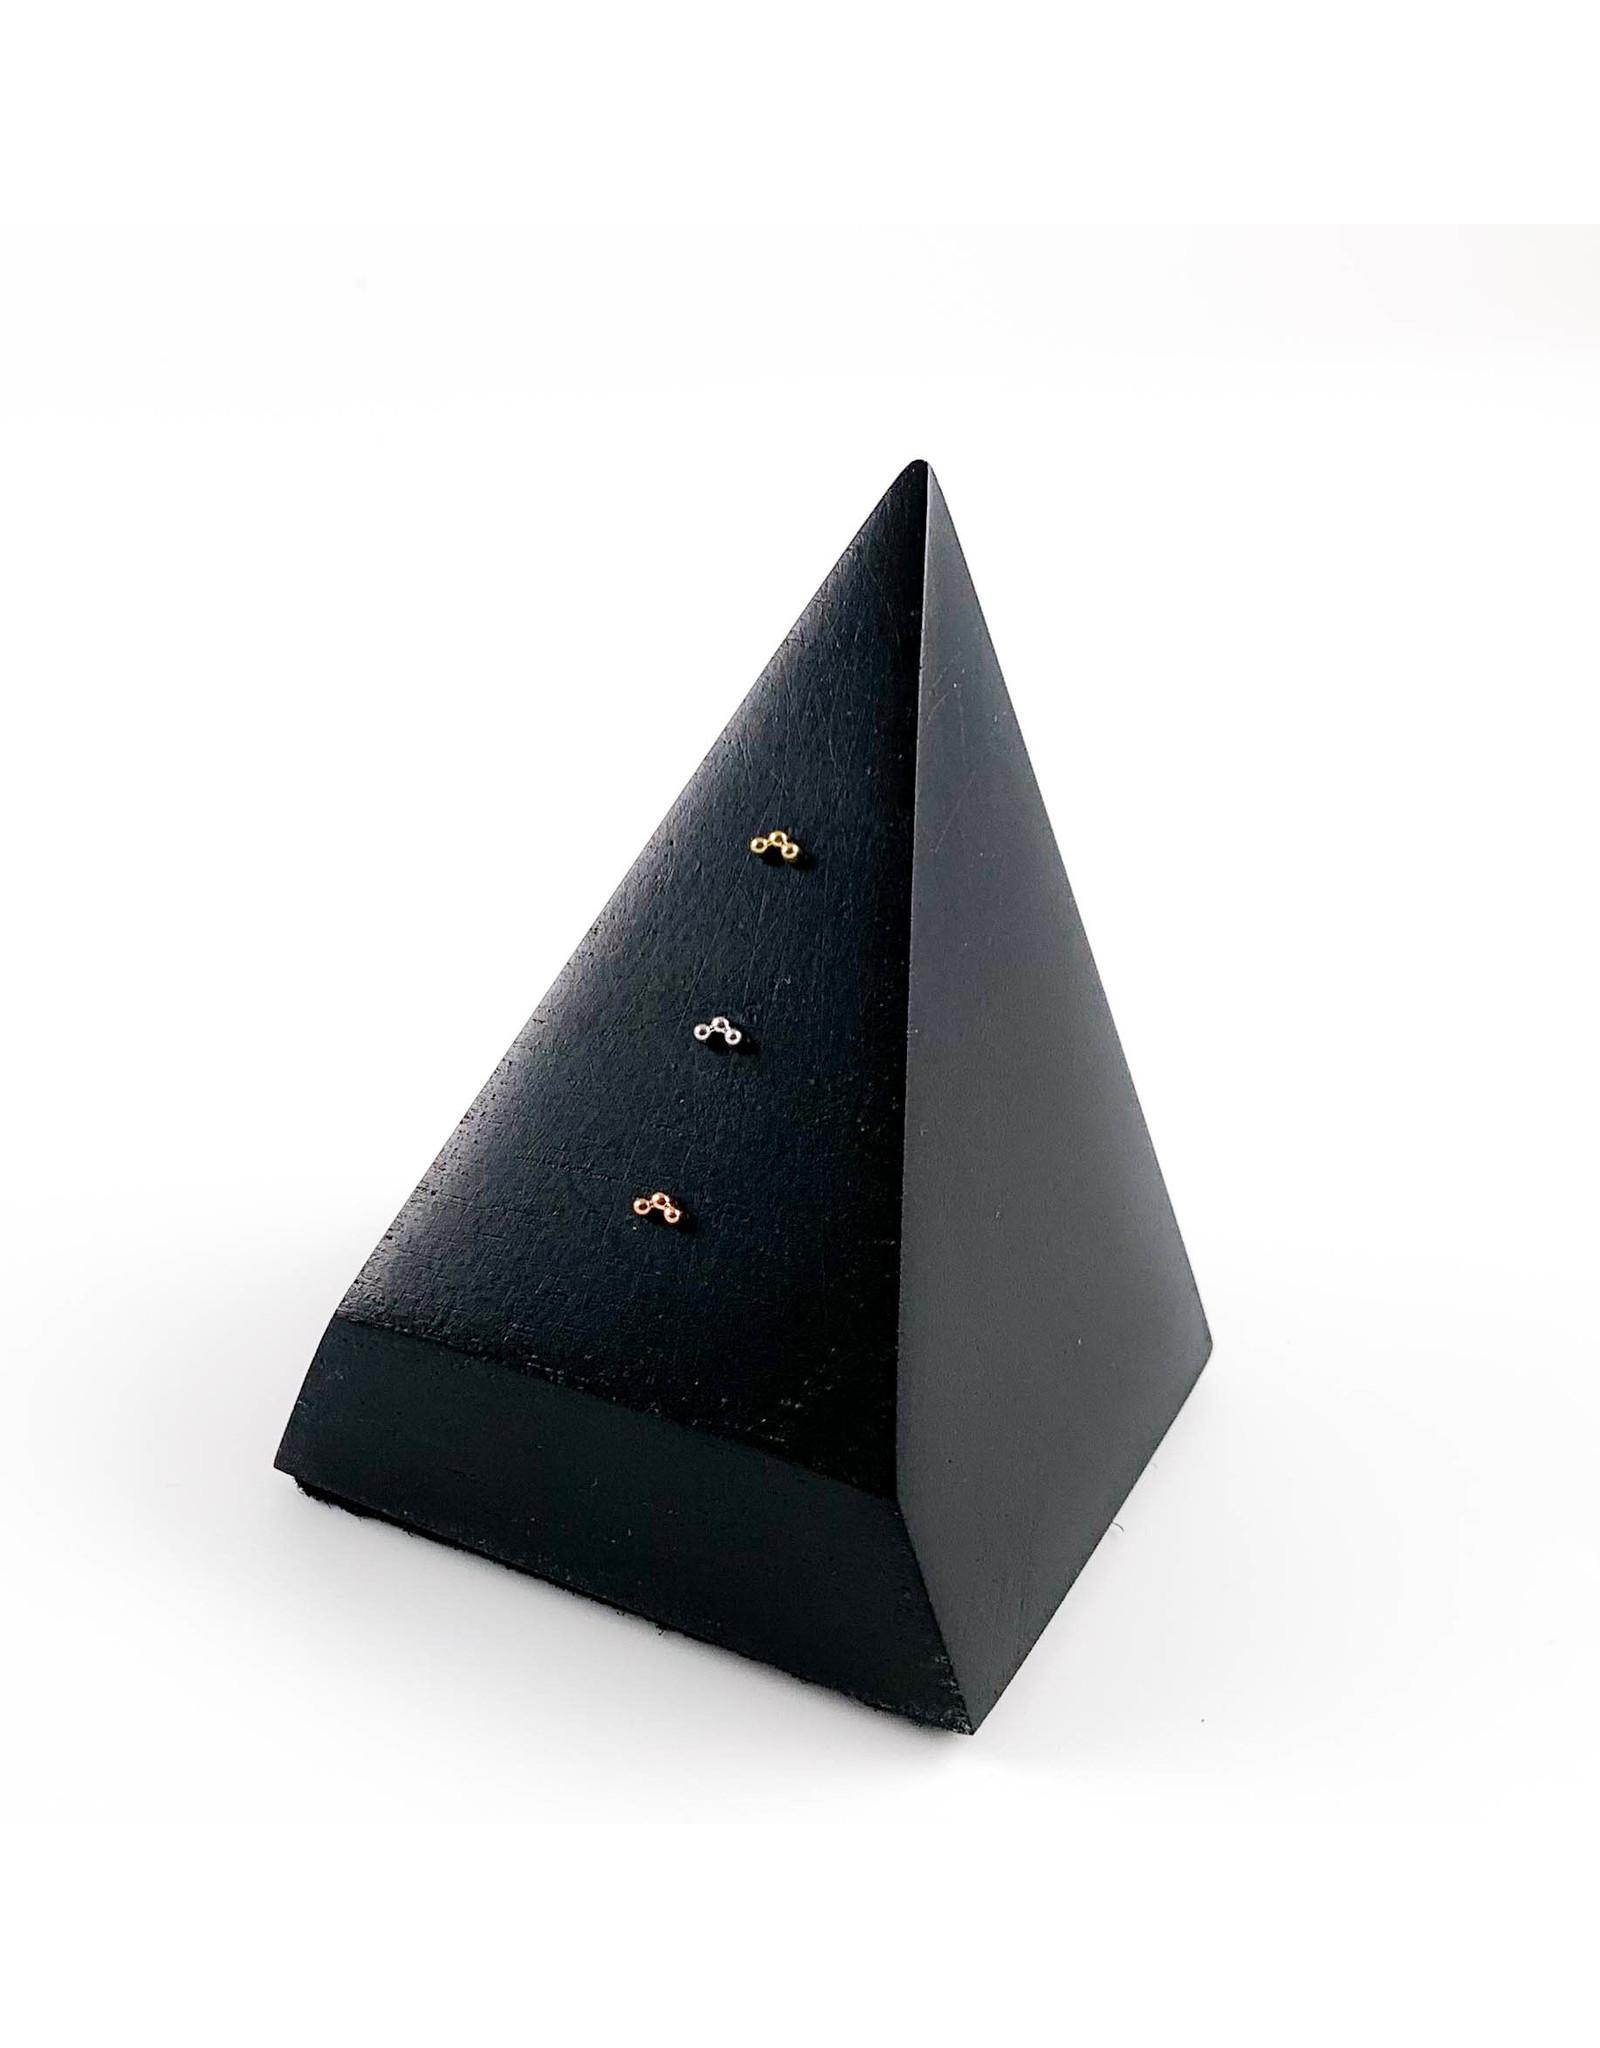 BVLA BVLA Arc 3 bead cluster press fit end